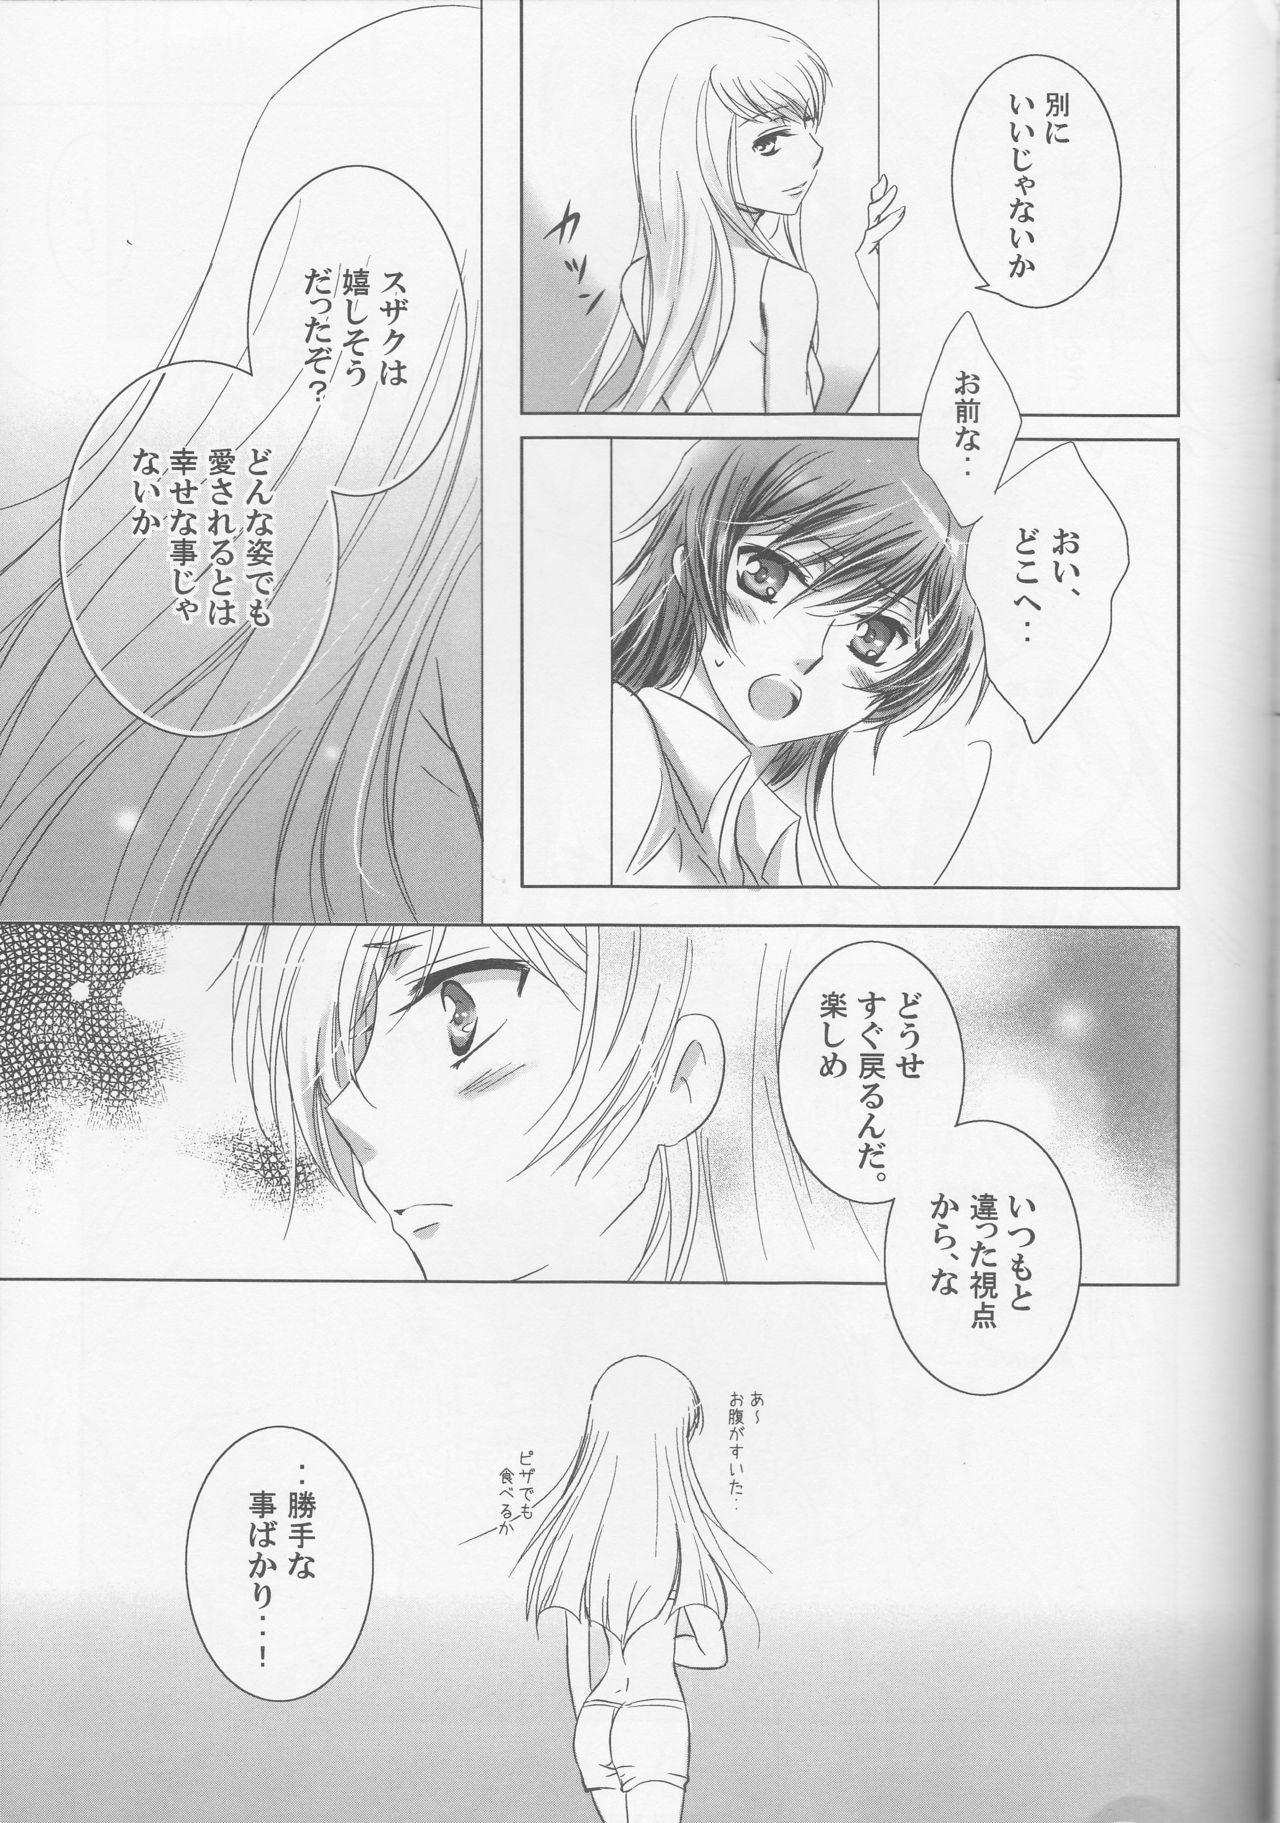 Mitaiken Ryouiki 6